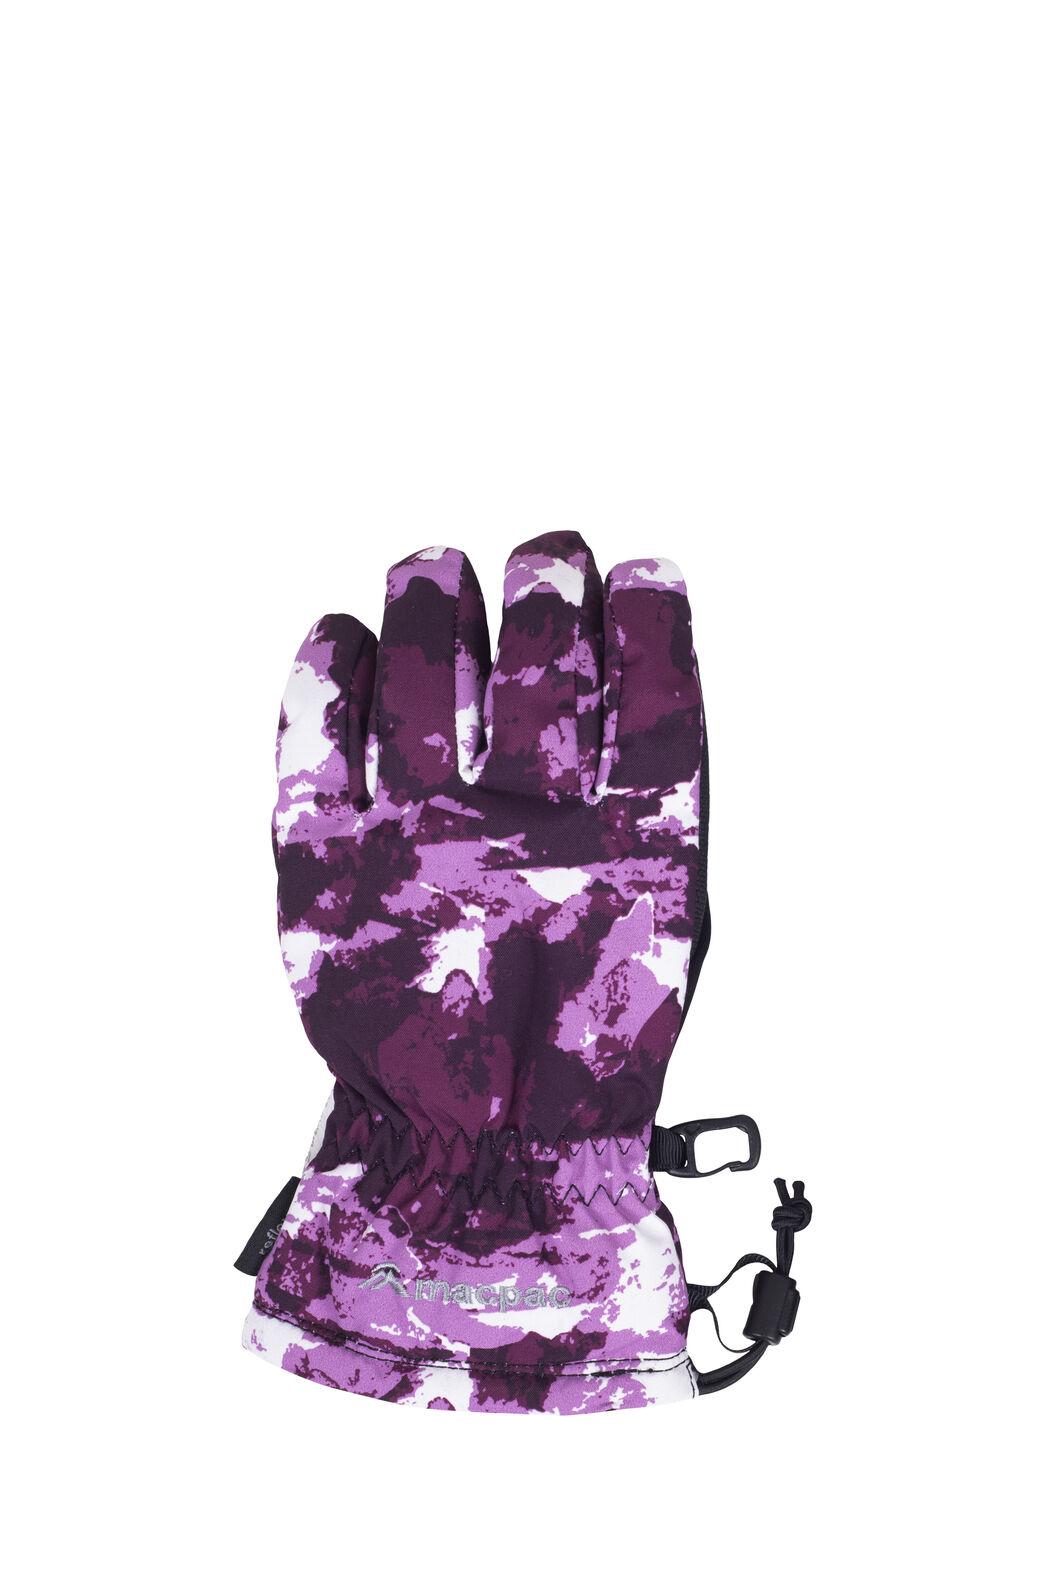 Macpac Spree Ski Gloves, Purple Print, hi-res